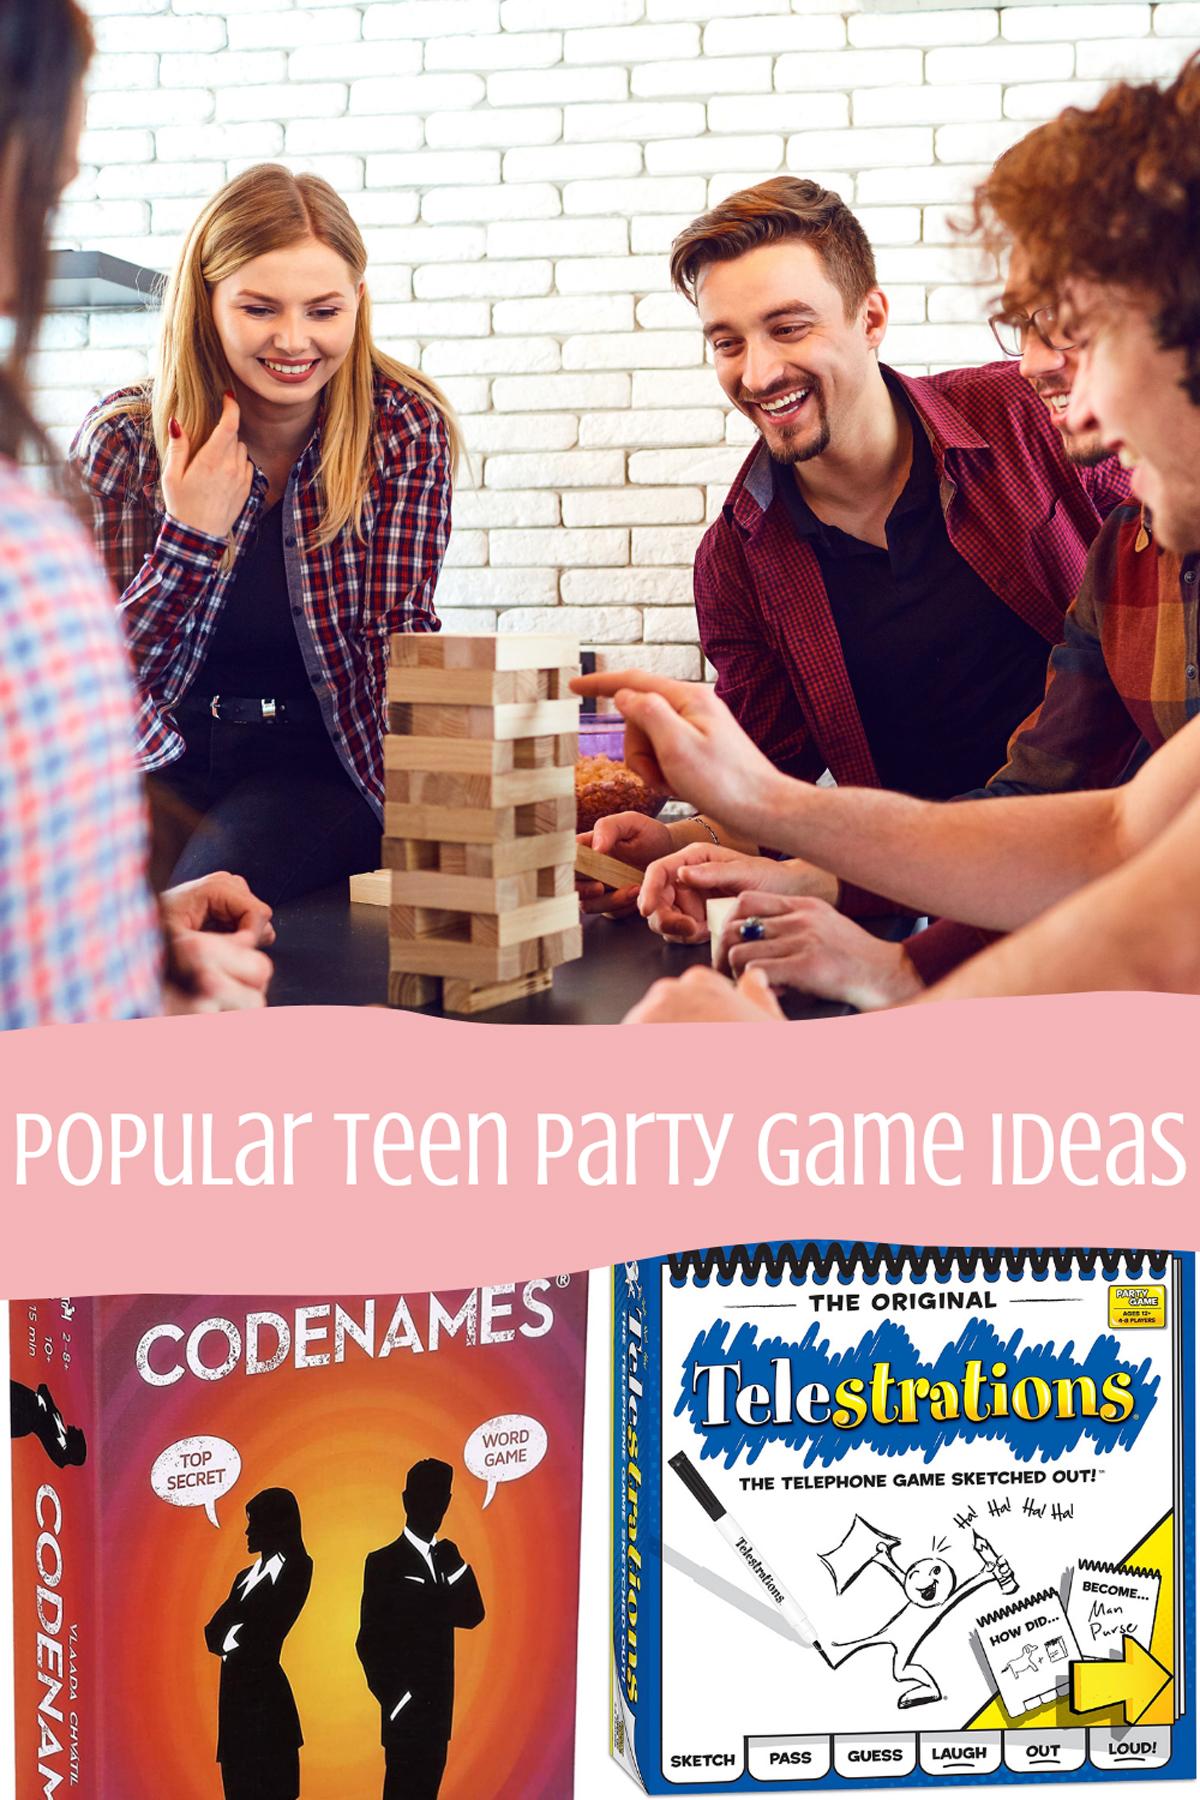 Popular Teen Party Games